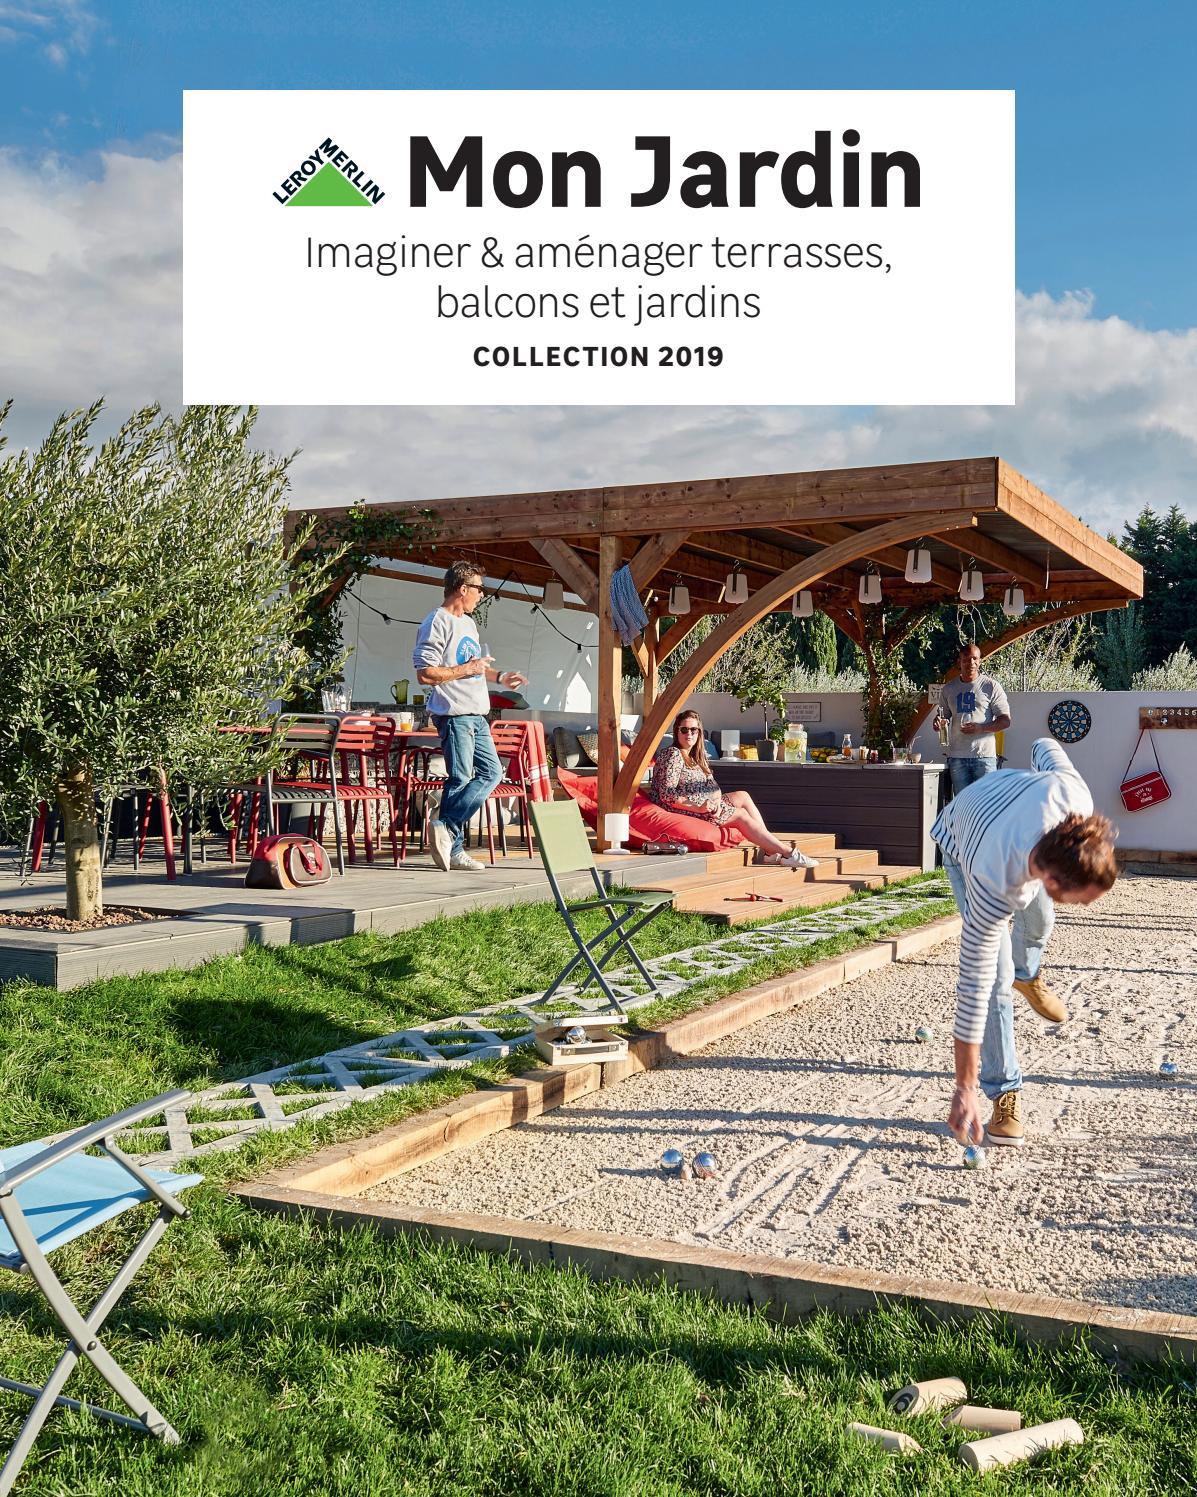 Leroy Merlin Reunion Guide Jardin 2019 By Agencecourtcircuit Issuu